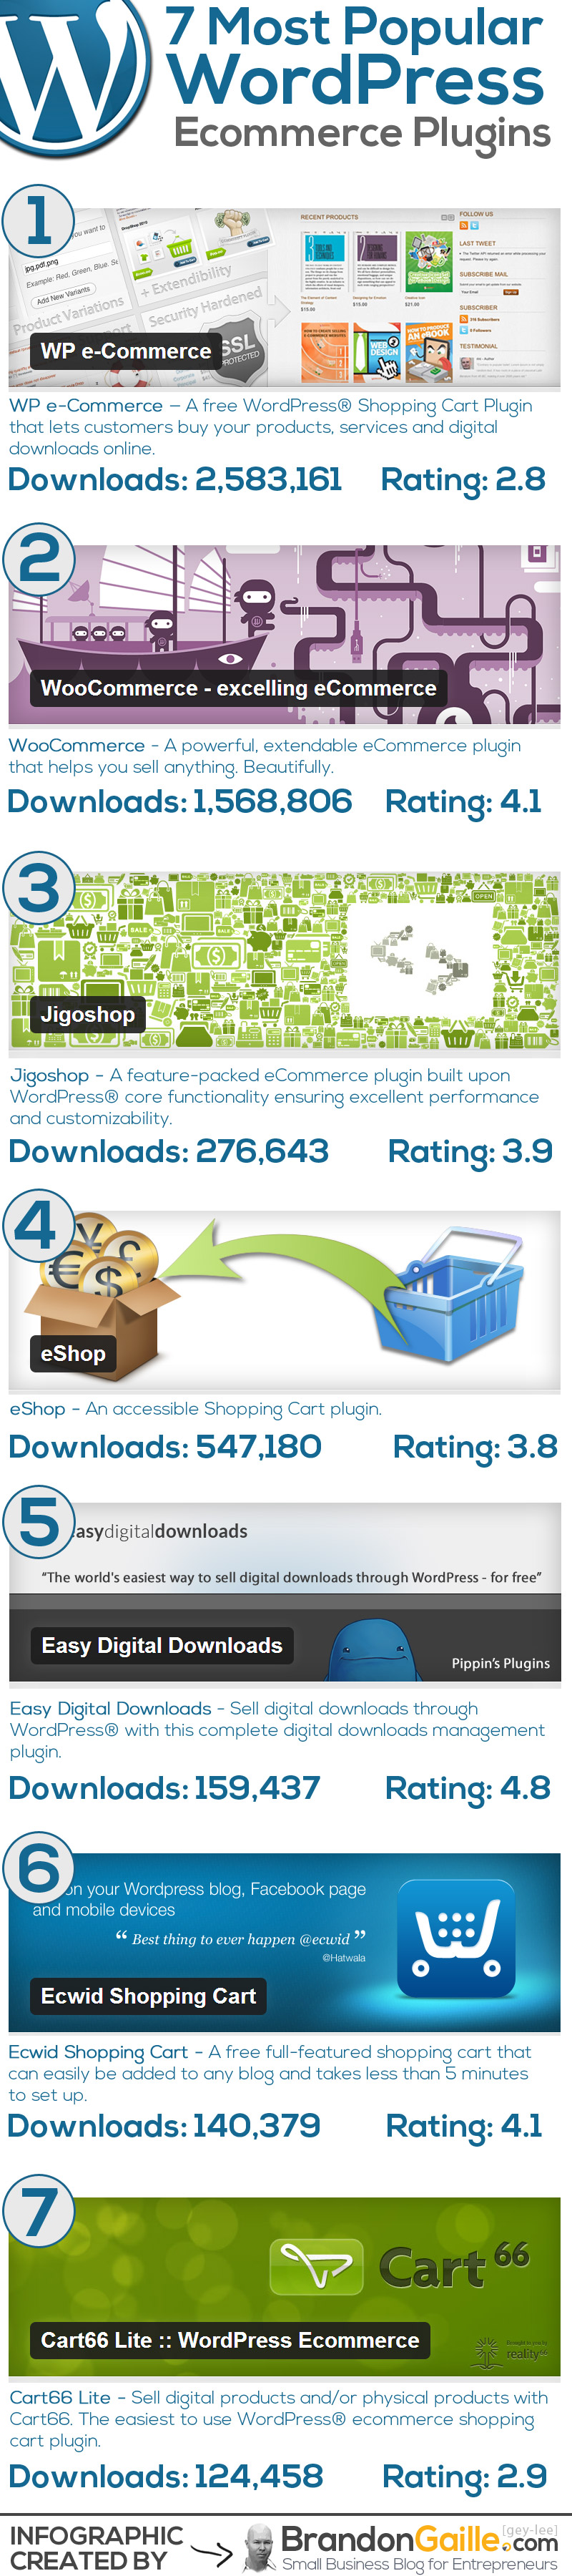 Best-Wordpress-eCommerce-Plugins-Infographic